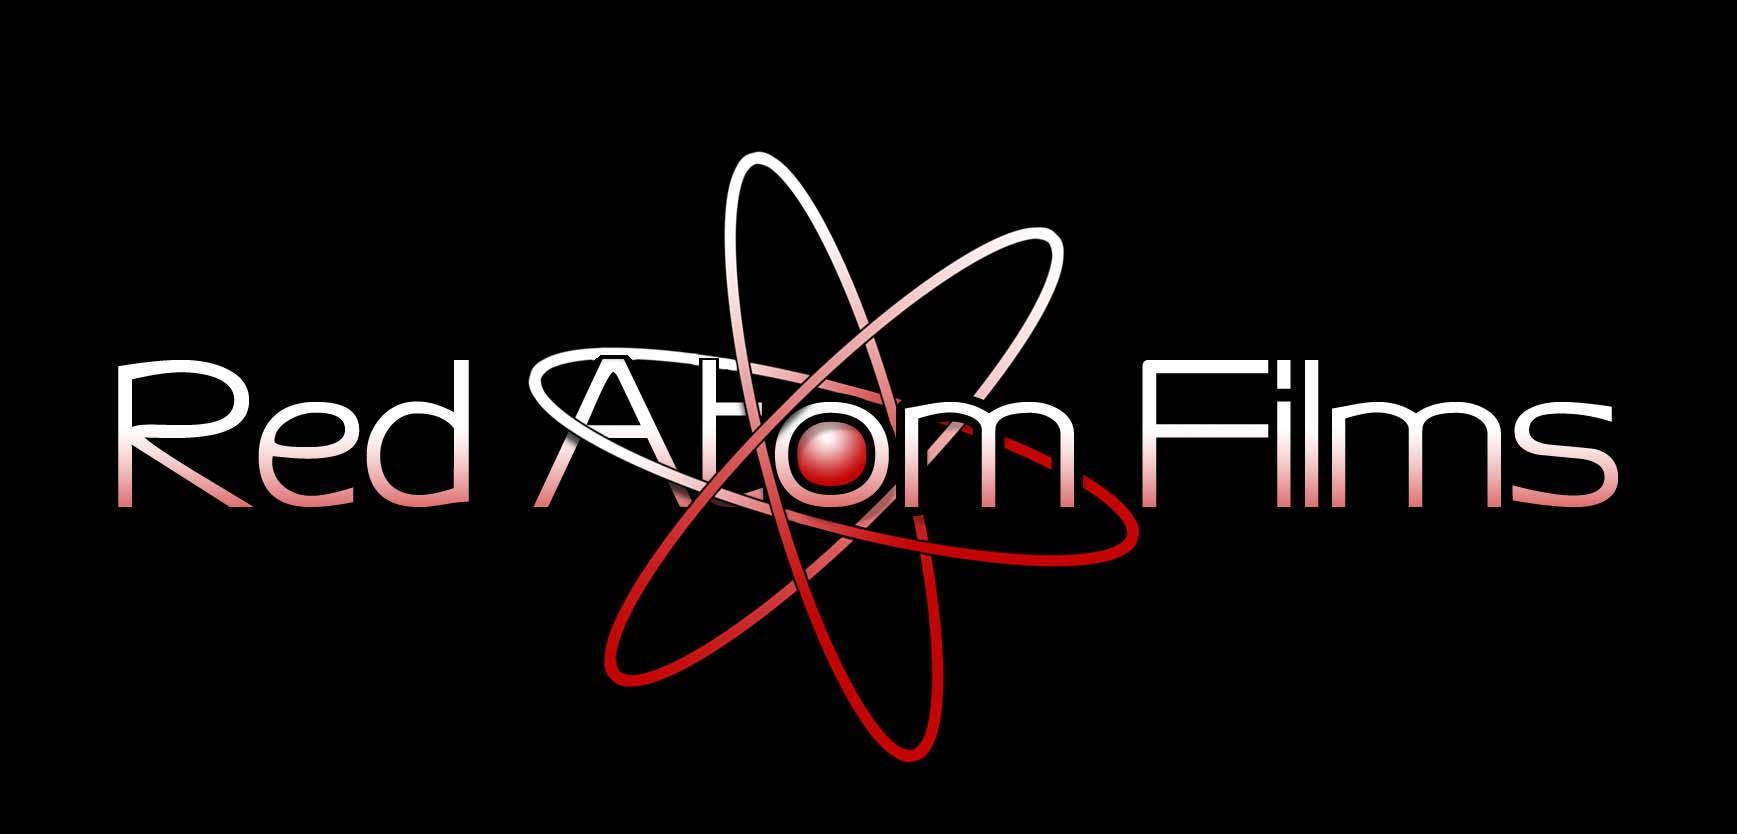 RedAtomFilms.logo4.jpg